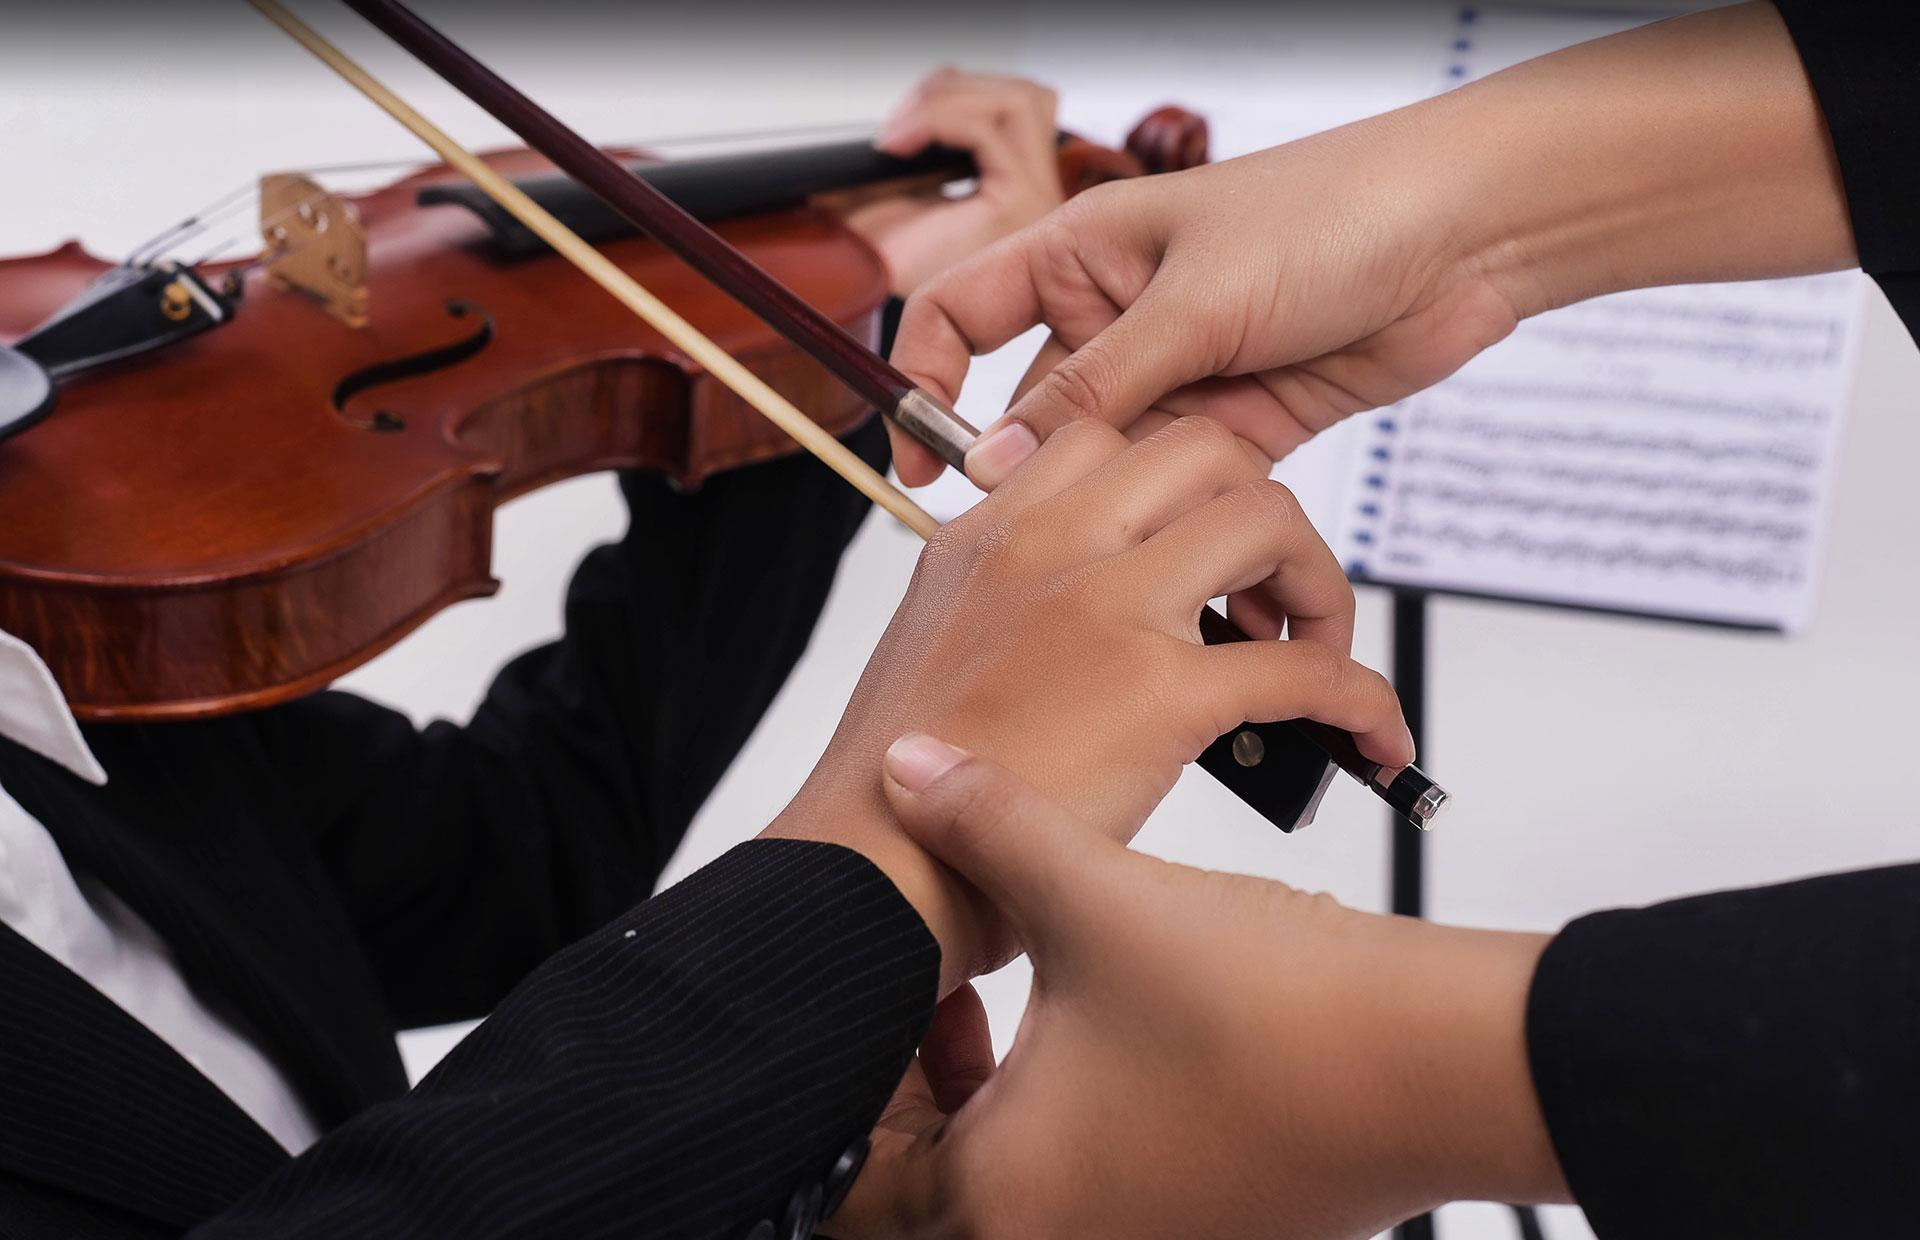 Hands instructing violin player